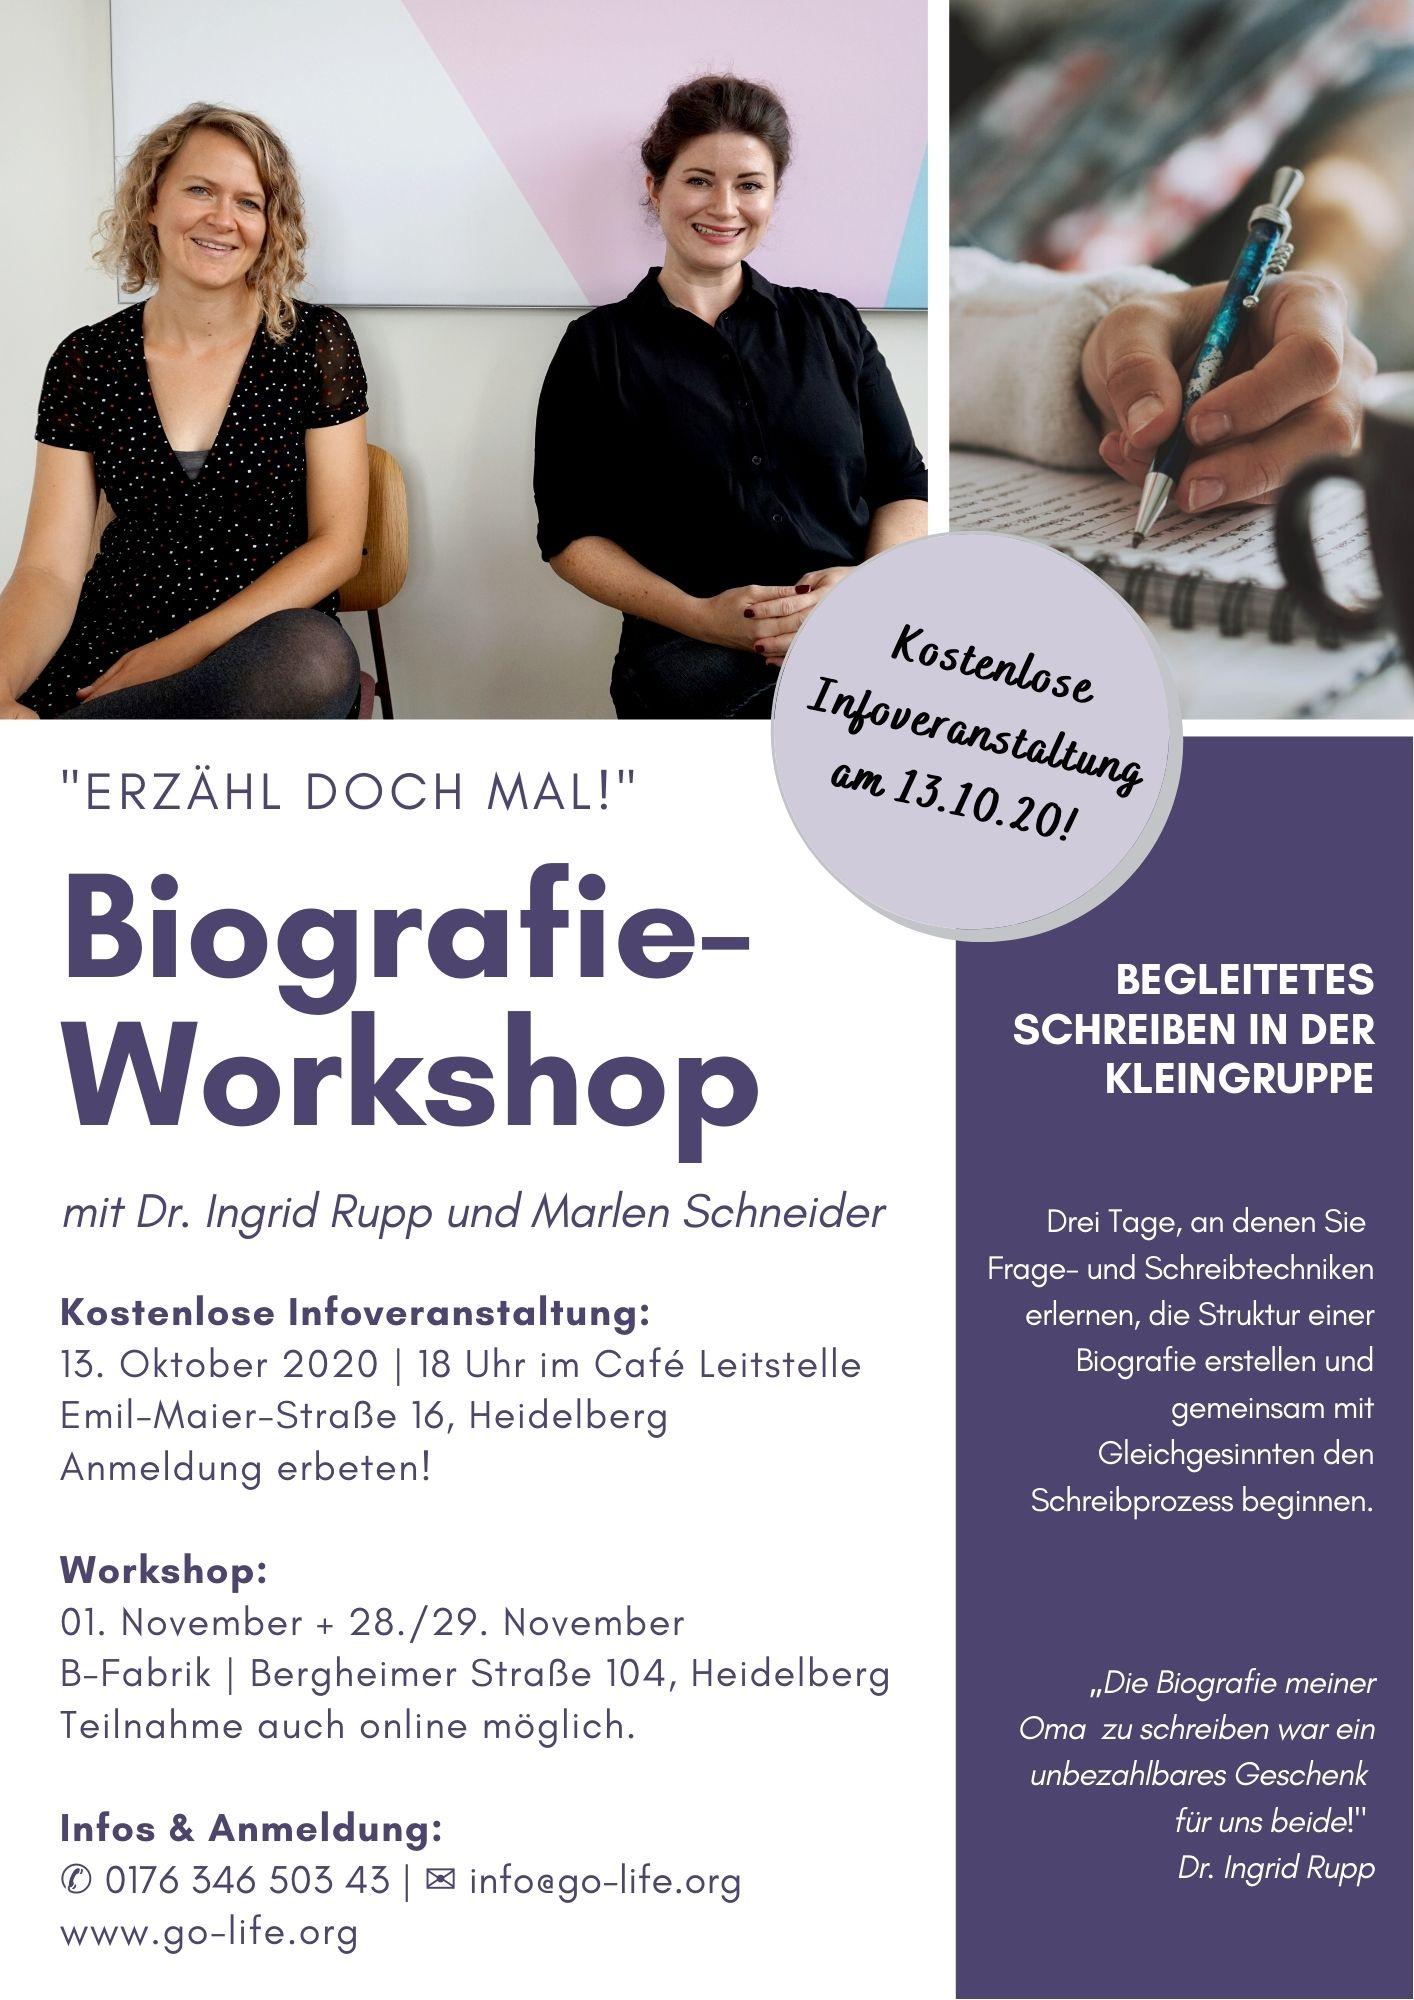 Biografie-Workshop-Flyer-Bild